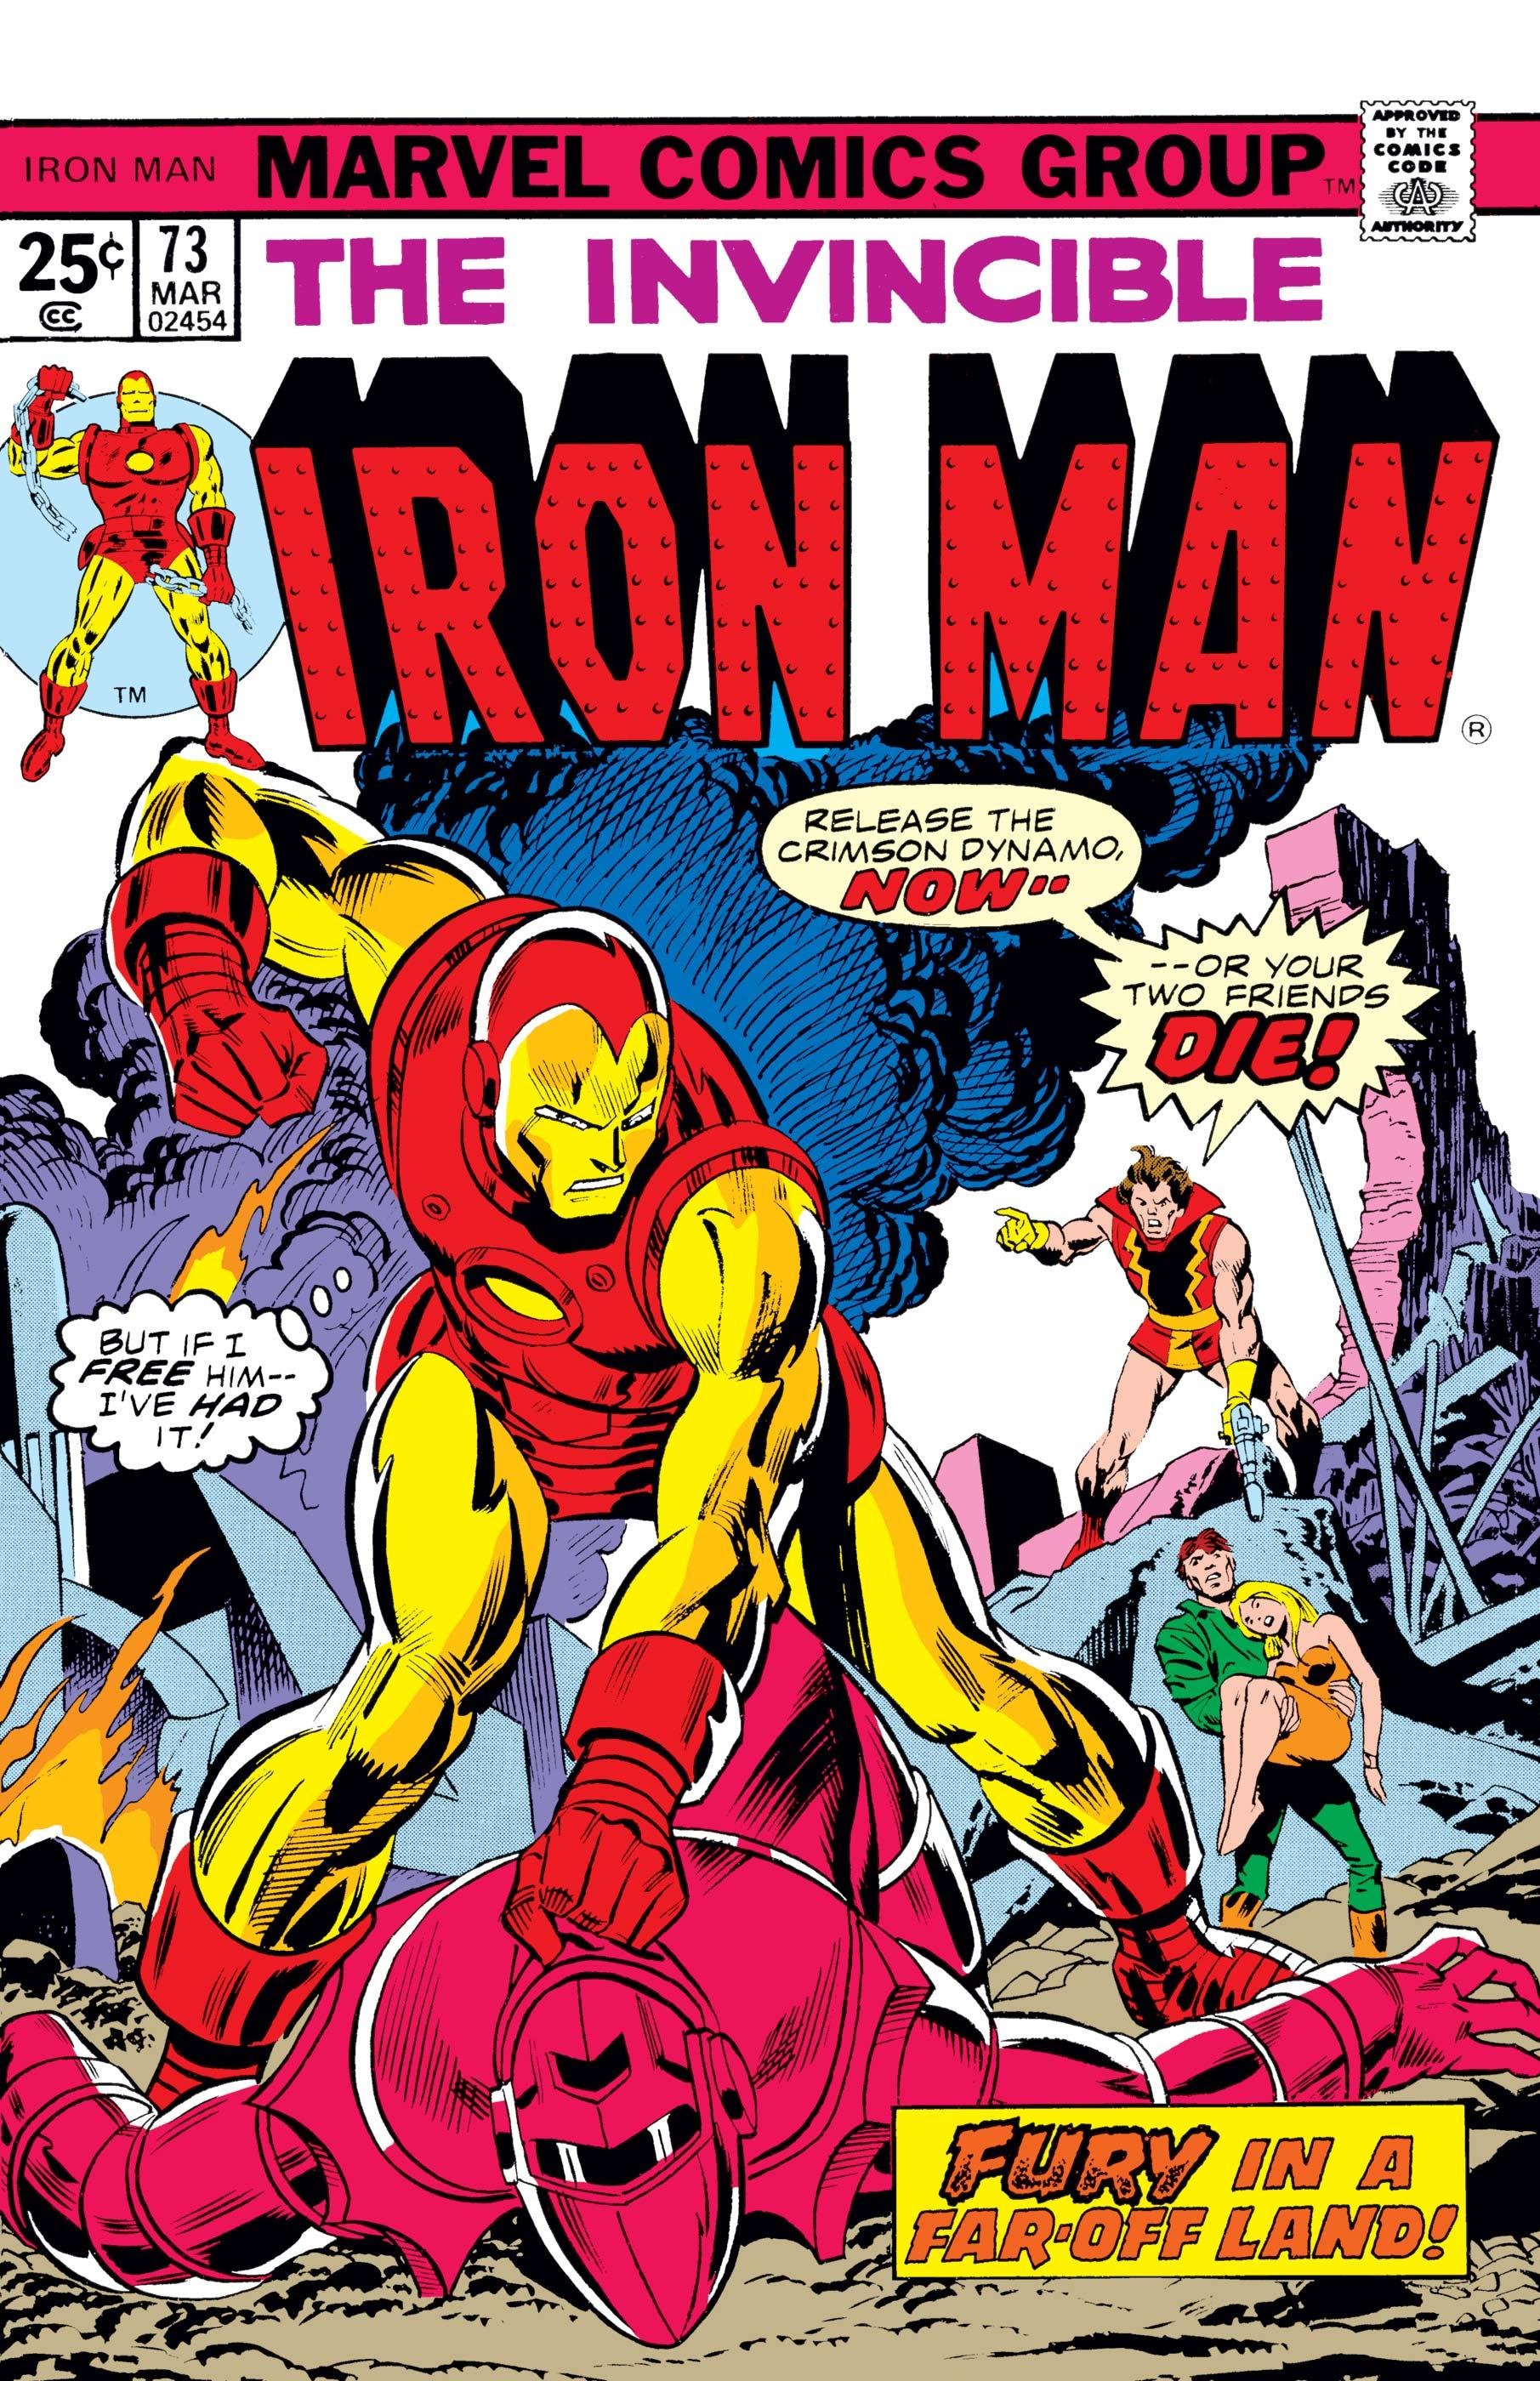 Iron Man (1968) #73